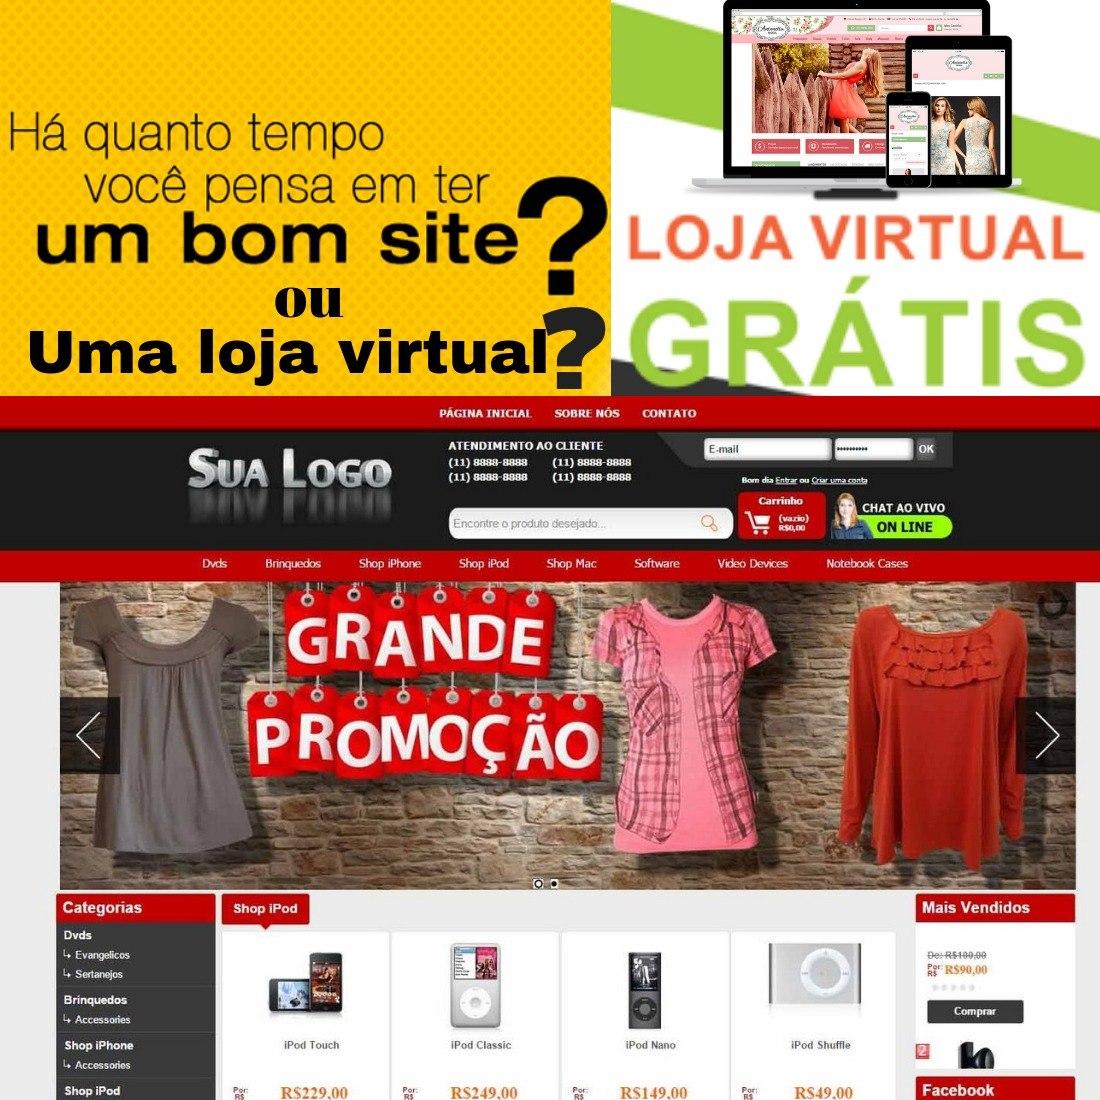 cd7231dbf Montar Ou Criar Loja Virtual Grátis S  Menssalidades Sites - R  90 ...